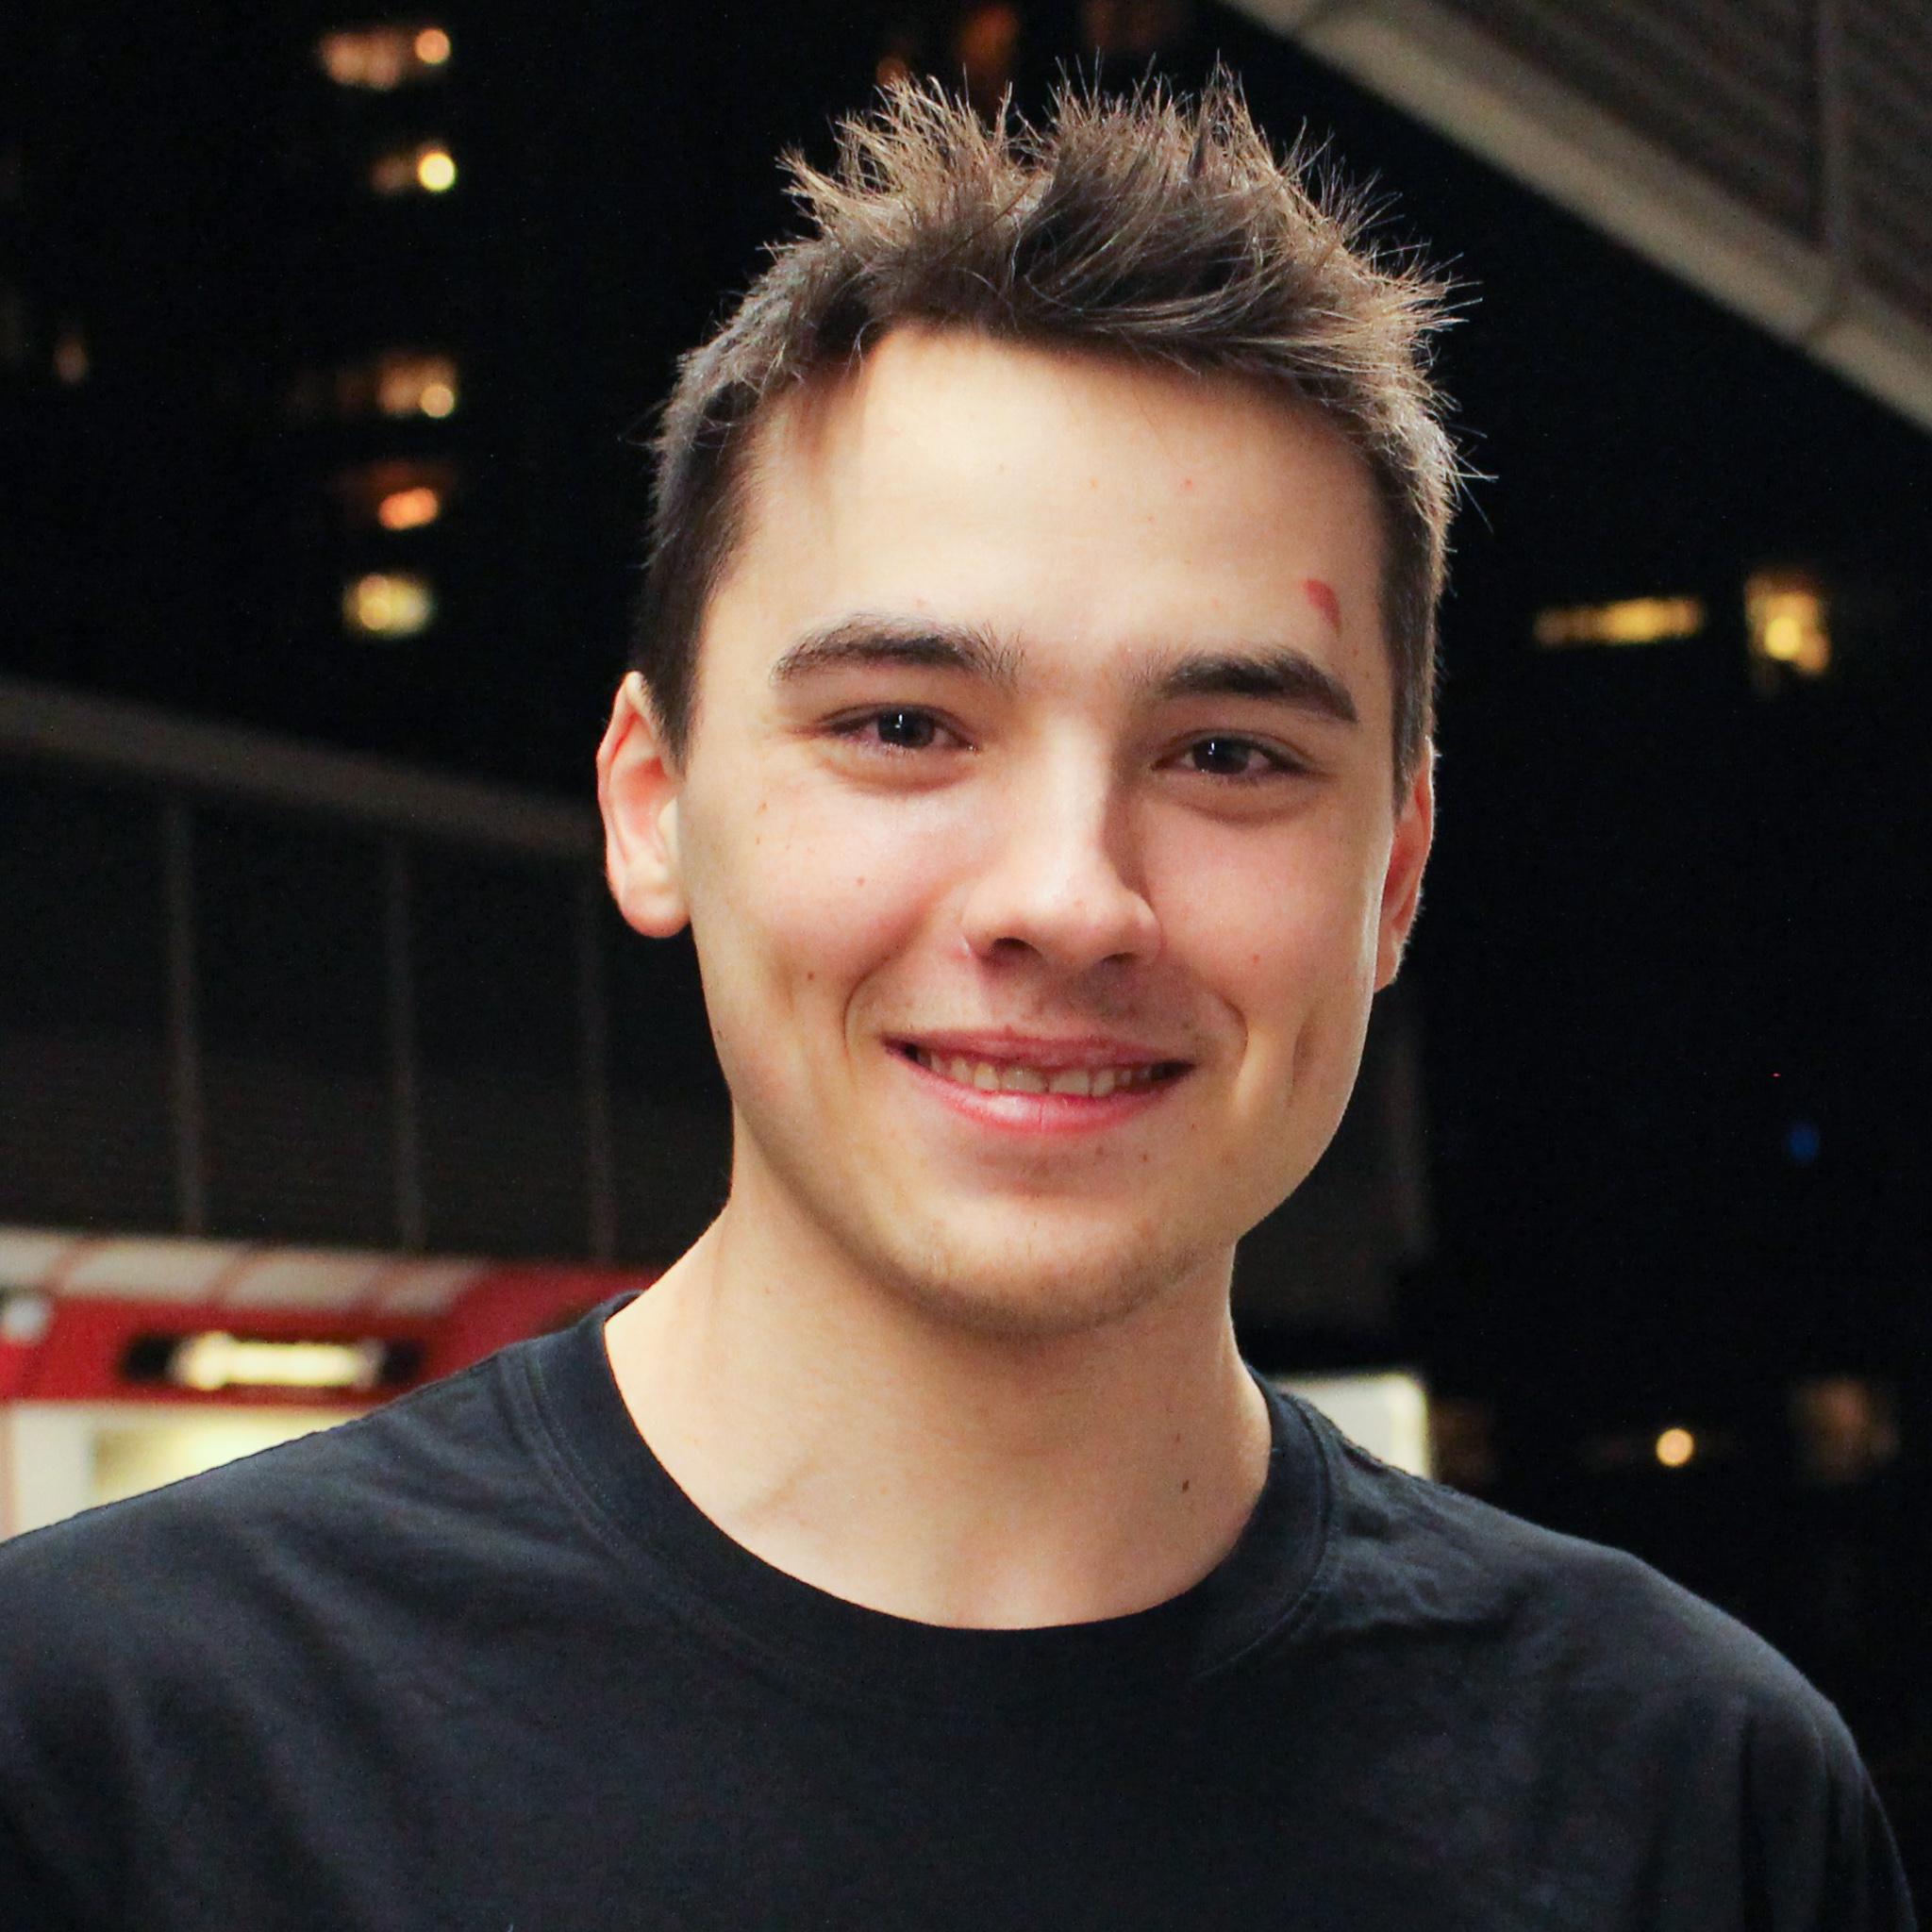 Matthias Estermann